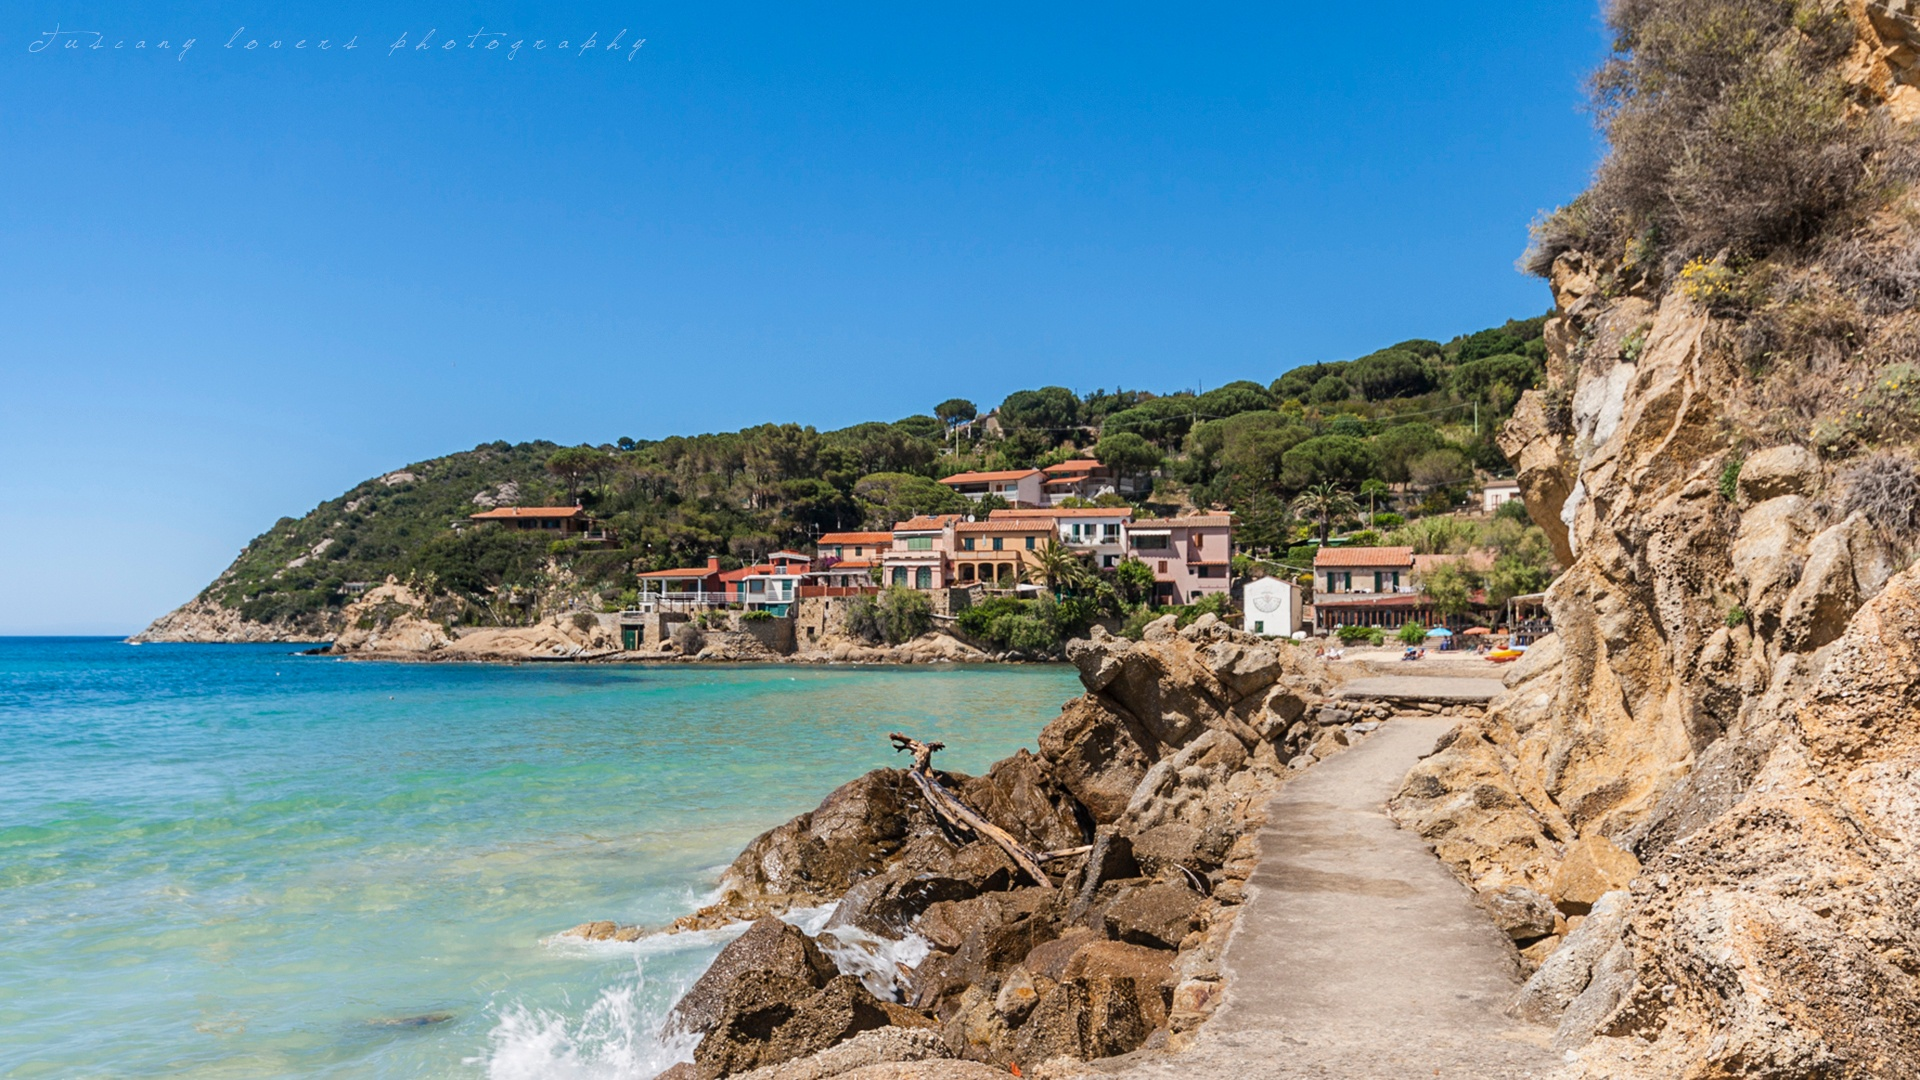 Path to Scaglieri by CARRARA Matteo